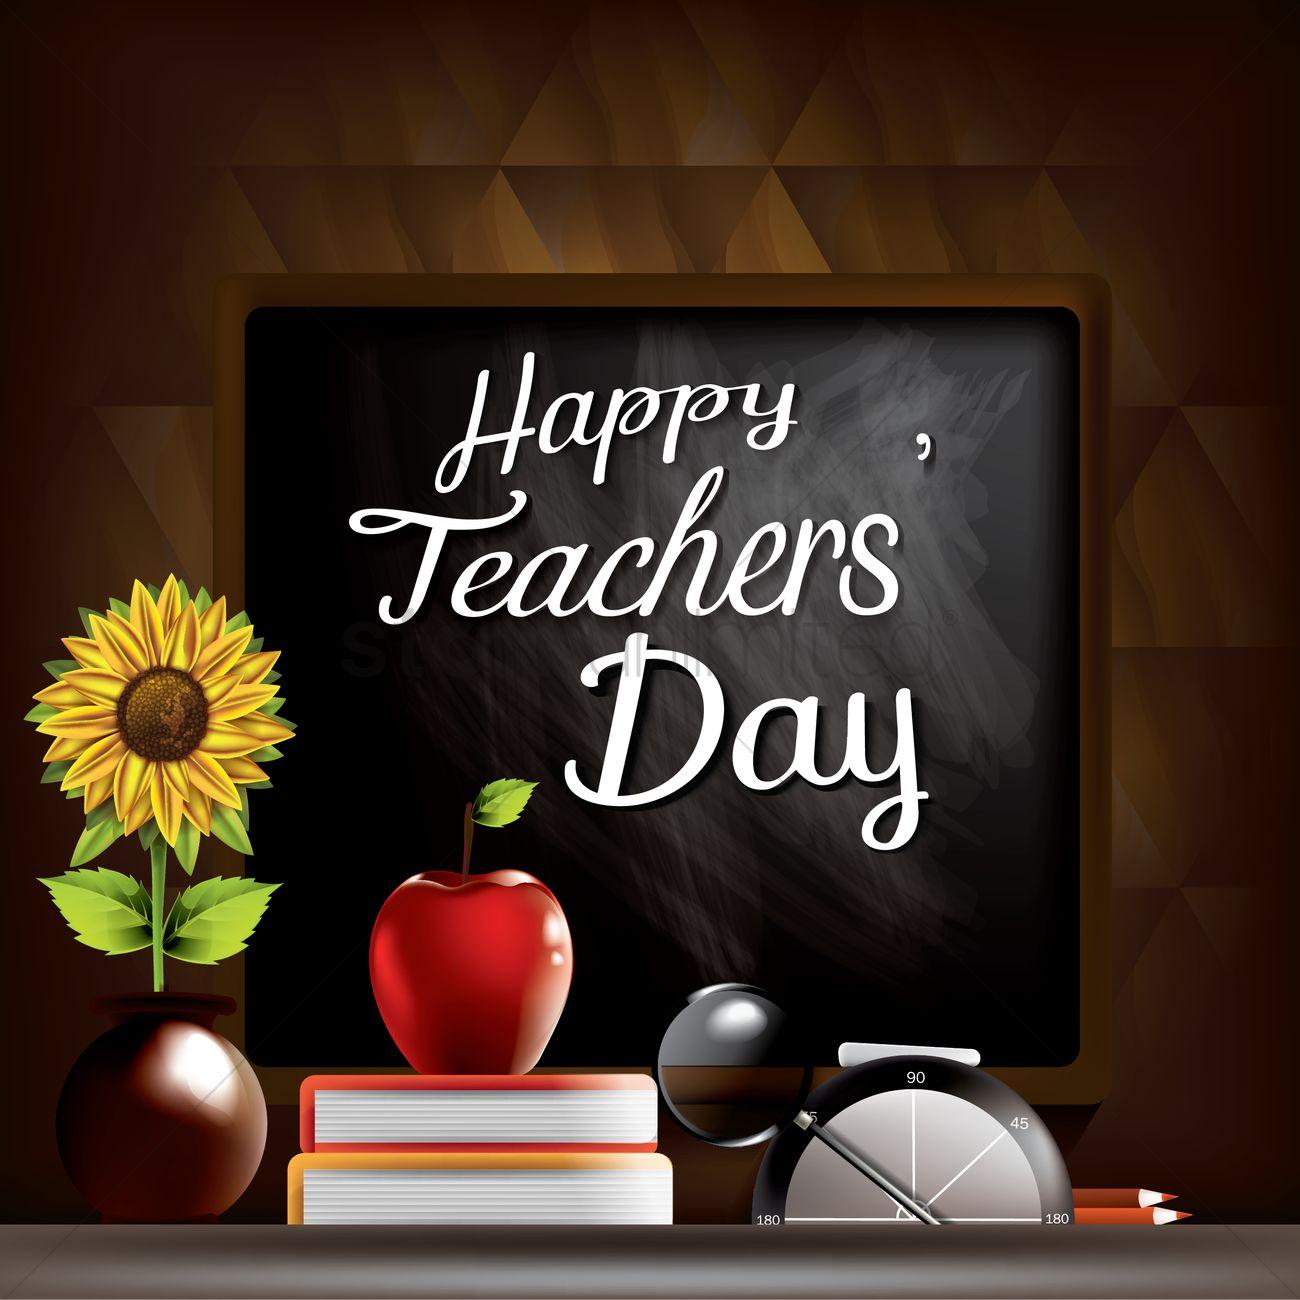 Teachers Day 2020 quotes